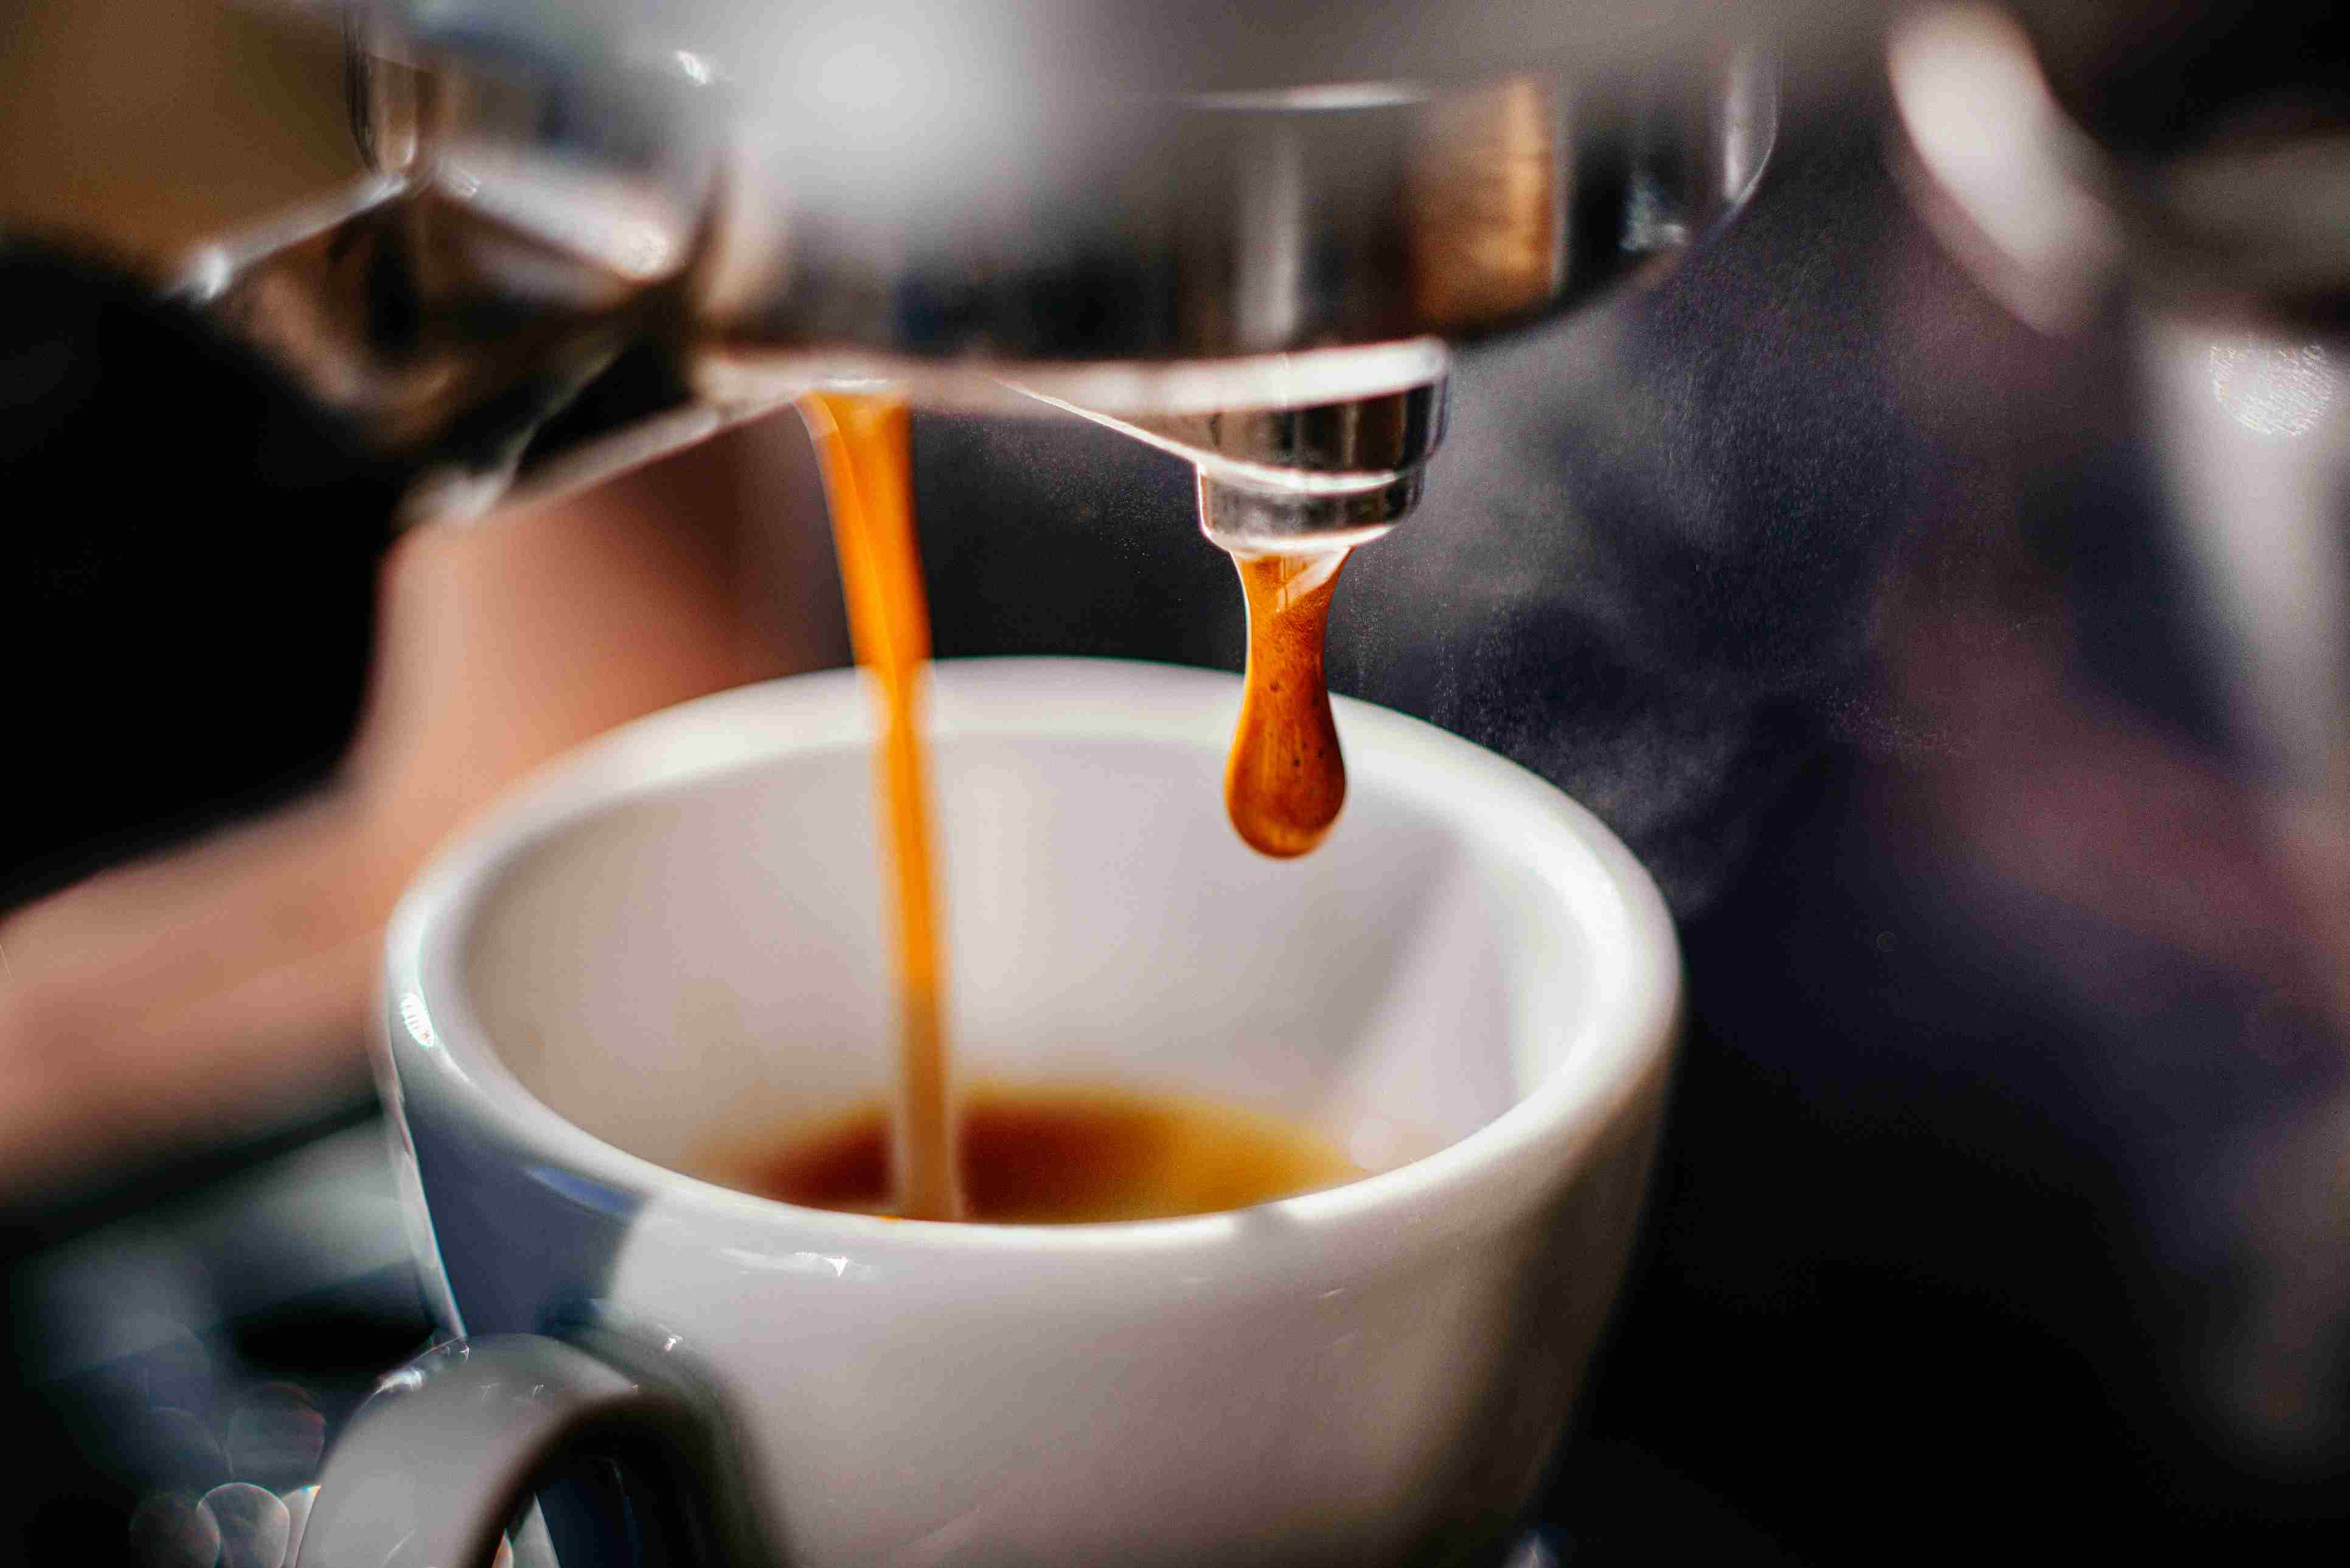 Espresso shot pouring out.